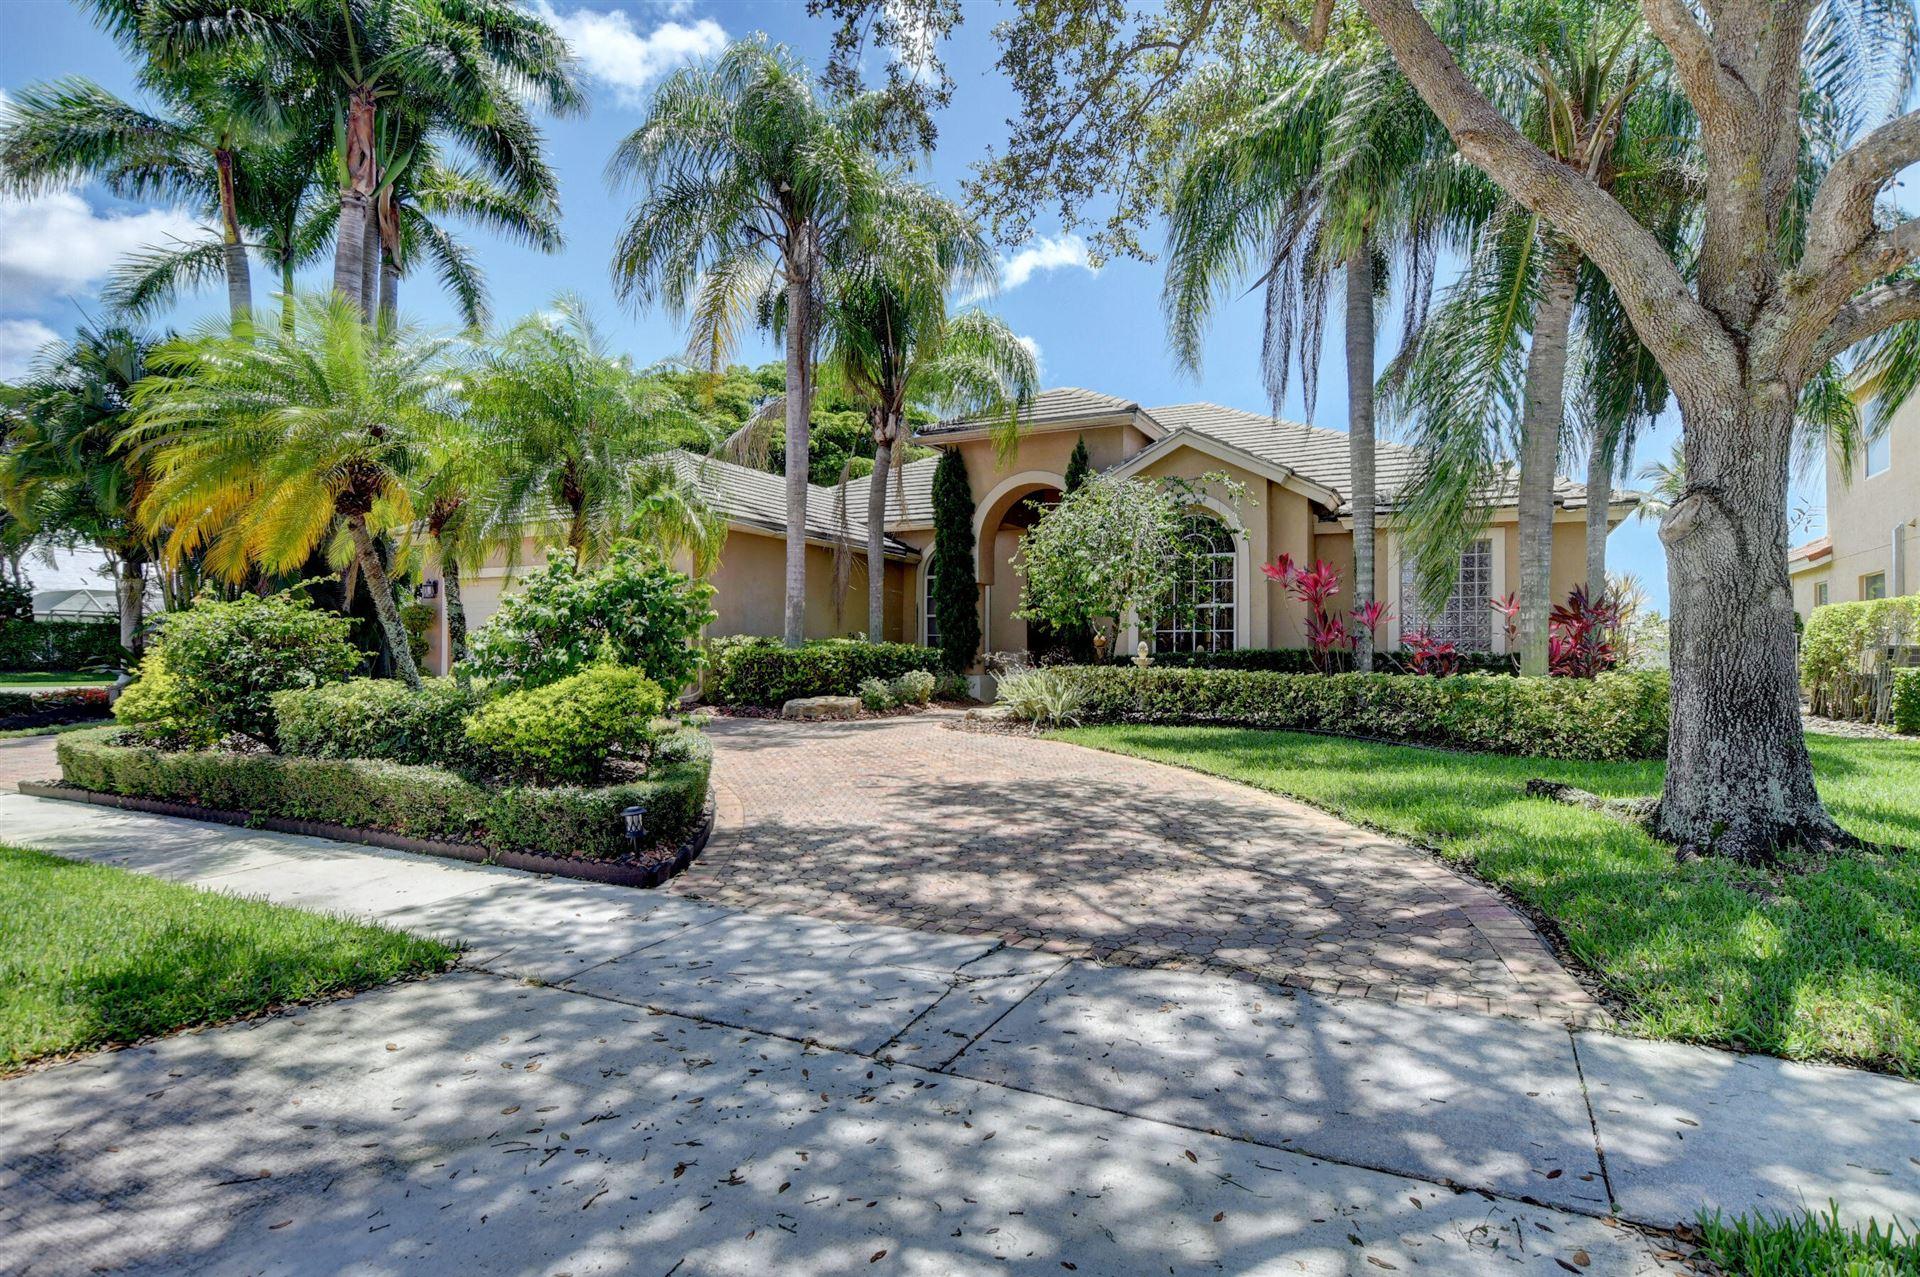 21632 Lynhurst Way, Boca Raton, FL 33428 - MLS#: RX-10729509